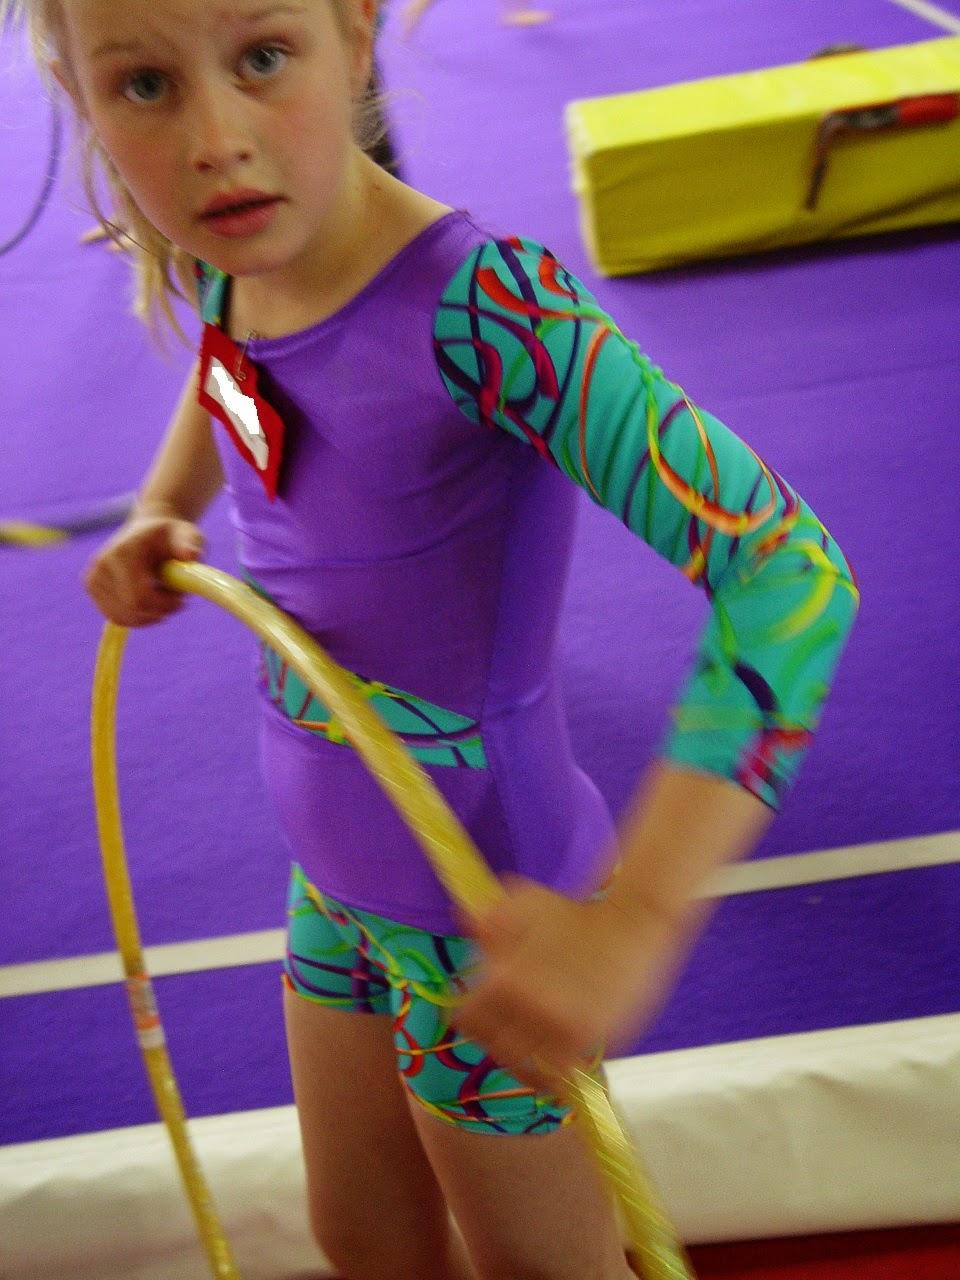 THE SEWING DORK: Sewing Gymnastic Leotards